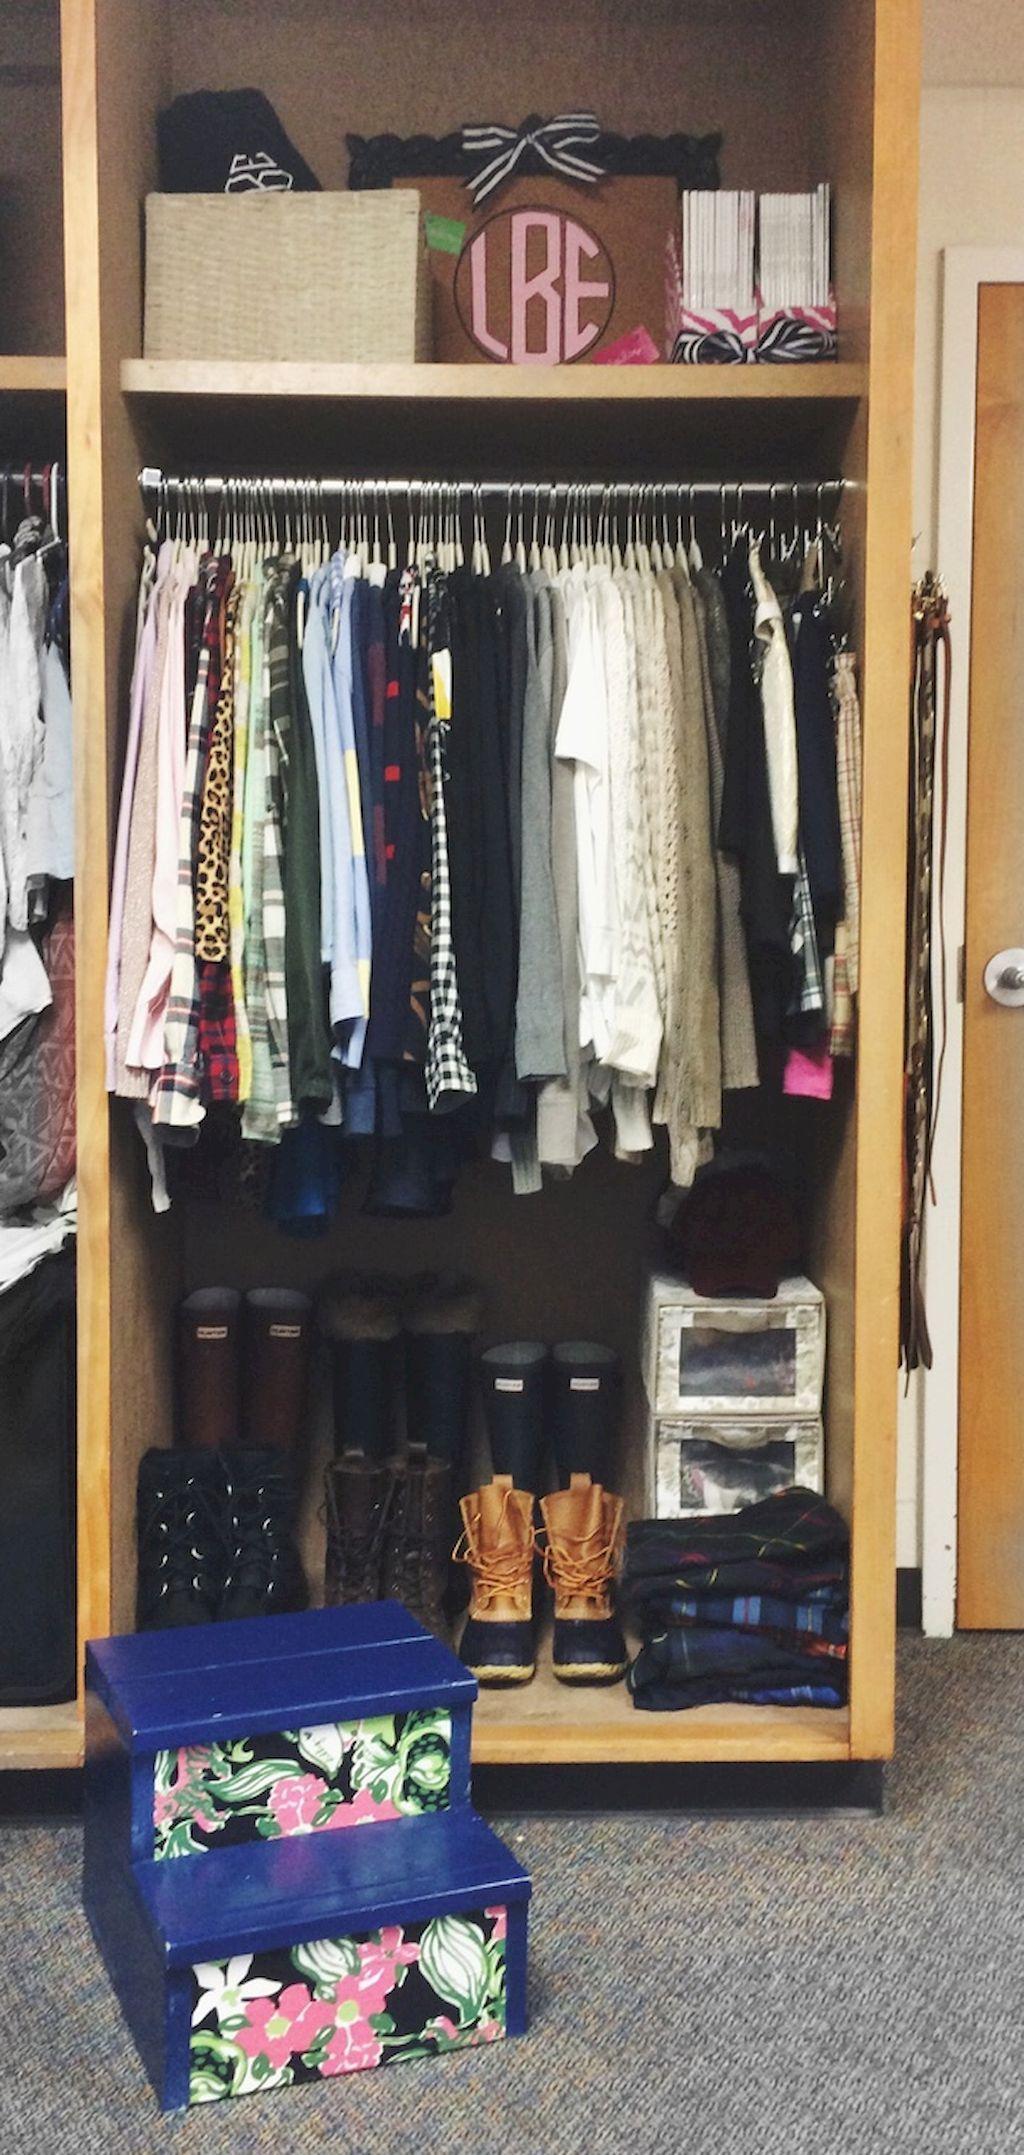 Dorm Room Closet: Creative Dorm Room Storage Organization Ideas On A Budget